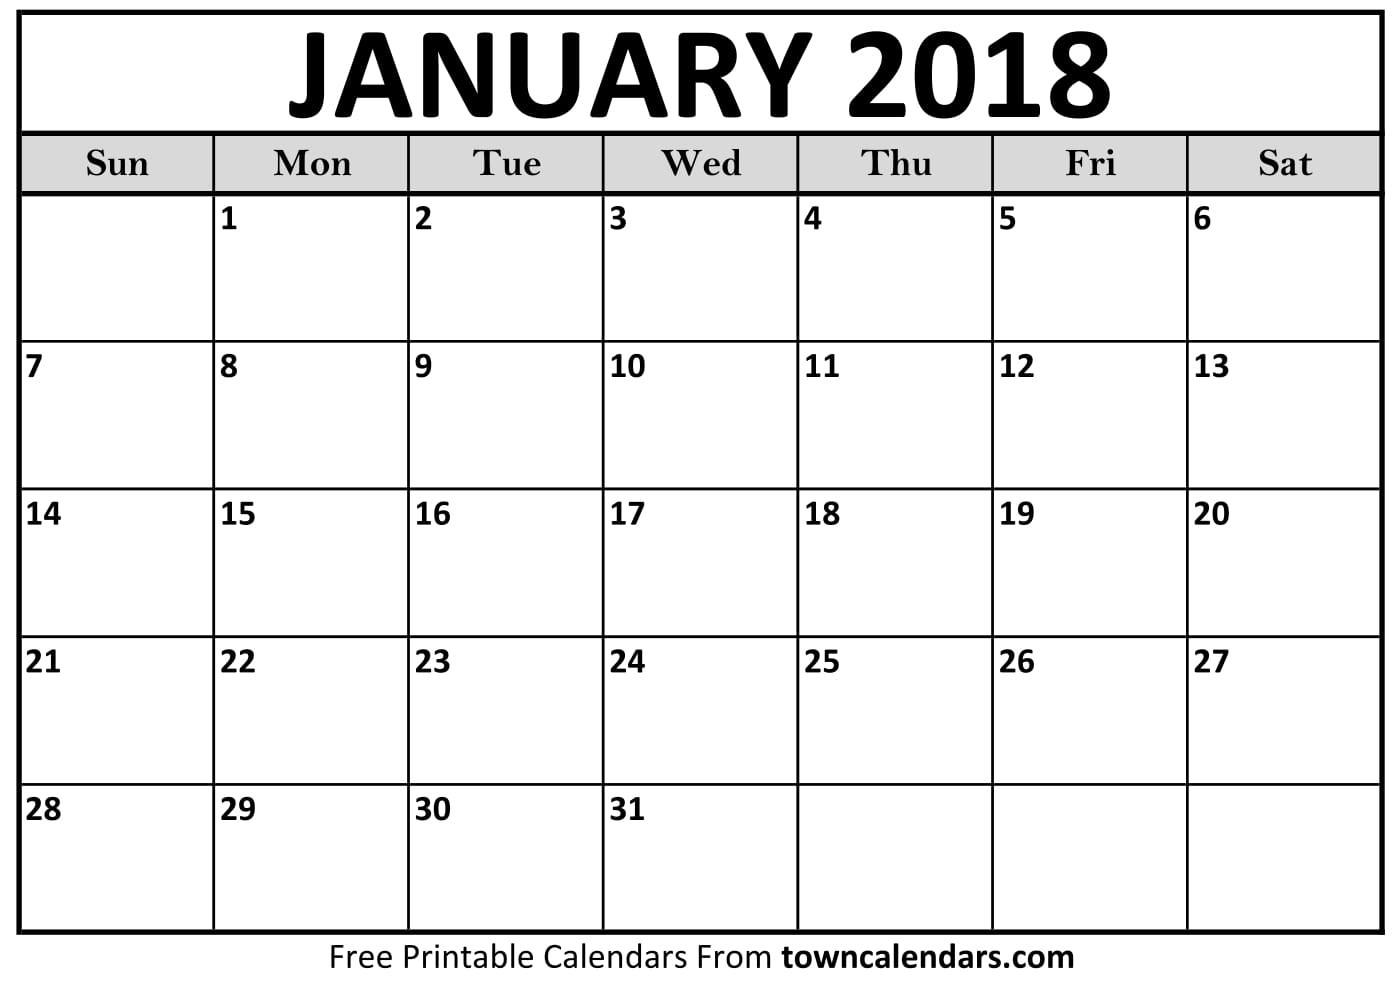 January Calendar Printable 2018 Calendar Printable towncalendars